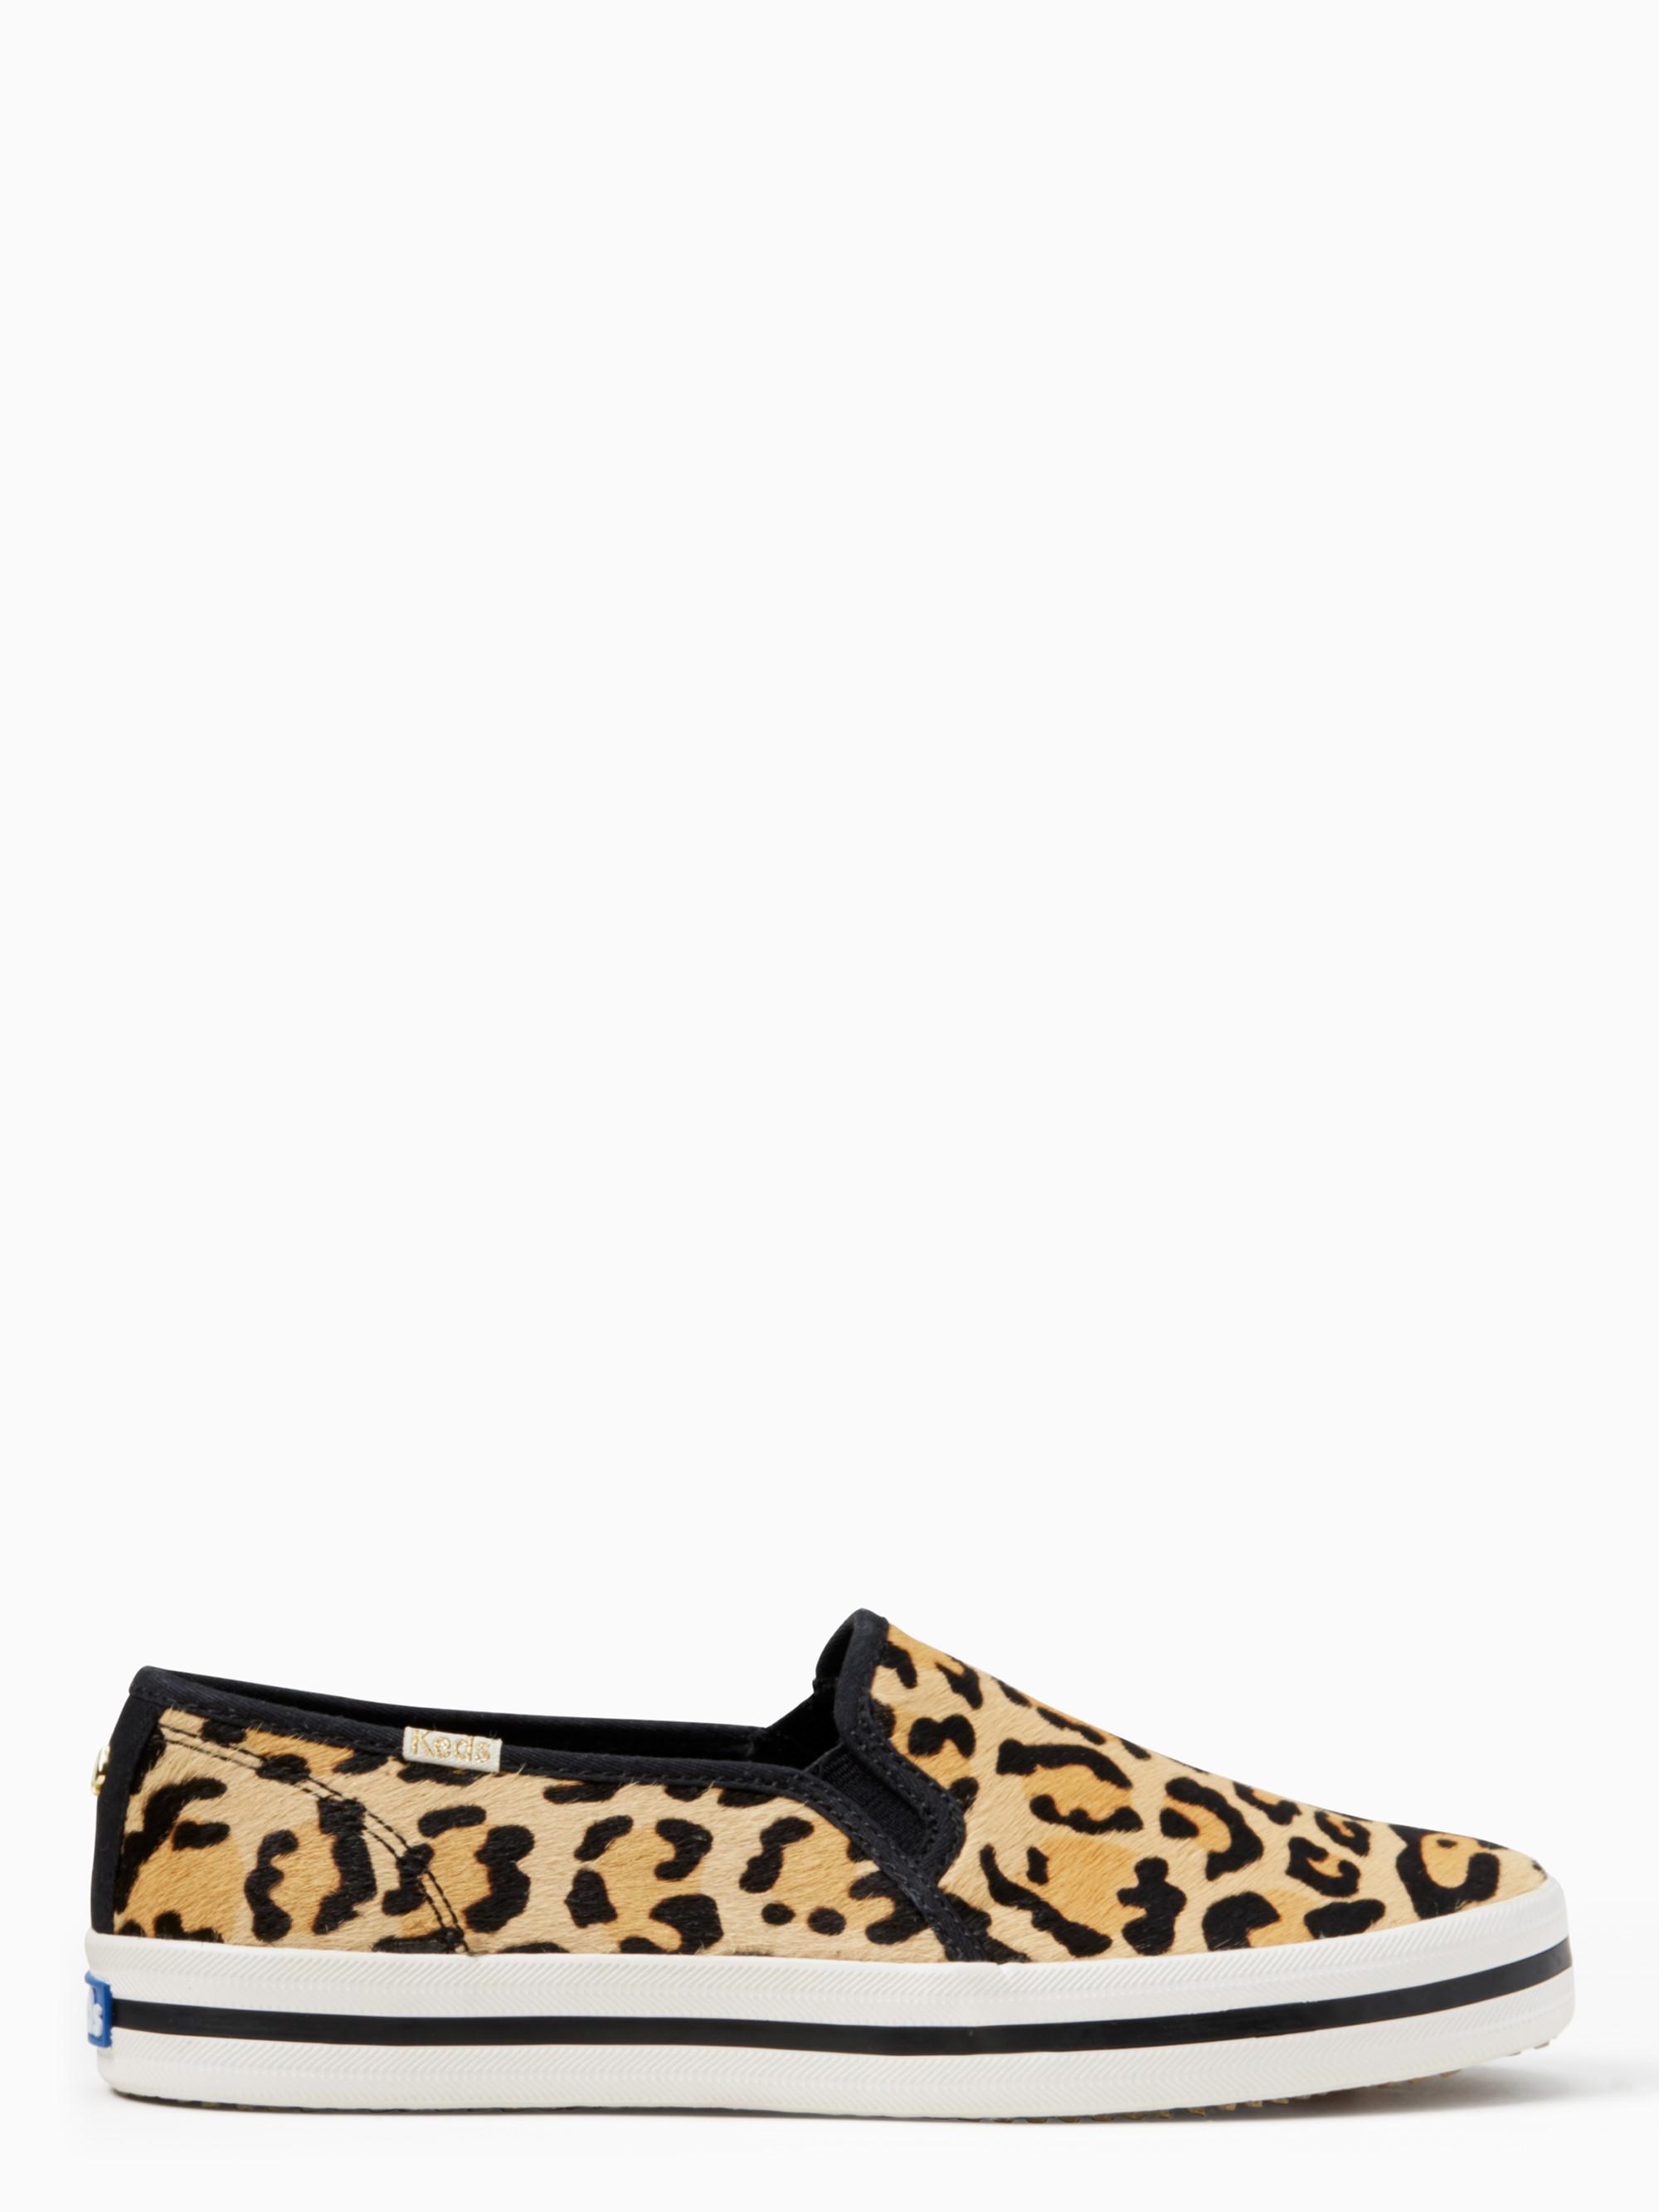 Kate Spade Keds For Double Decker Ks Leopard Pony Hair Sneakers